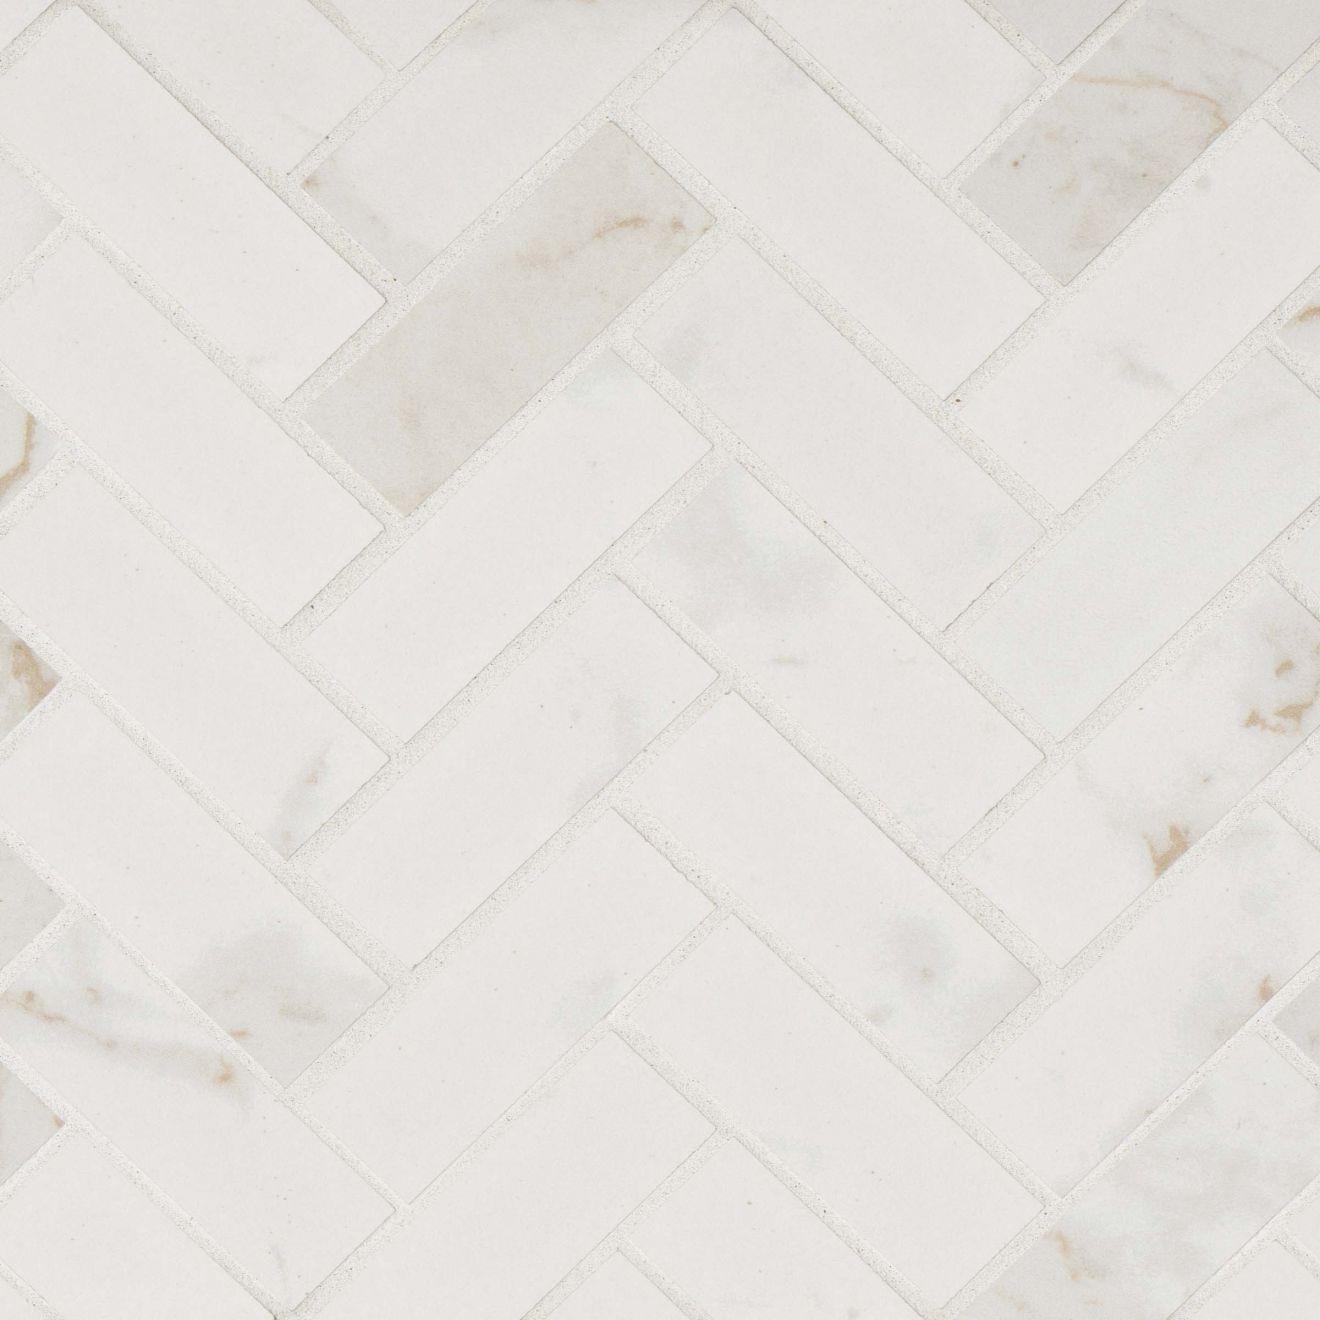 "Marmi Di Napoli 1"" x 4"" Floor & Wall Mosaic in Calacatta"